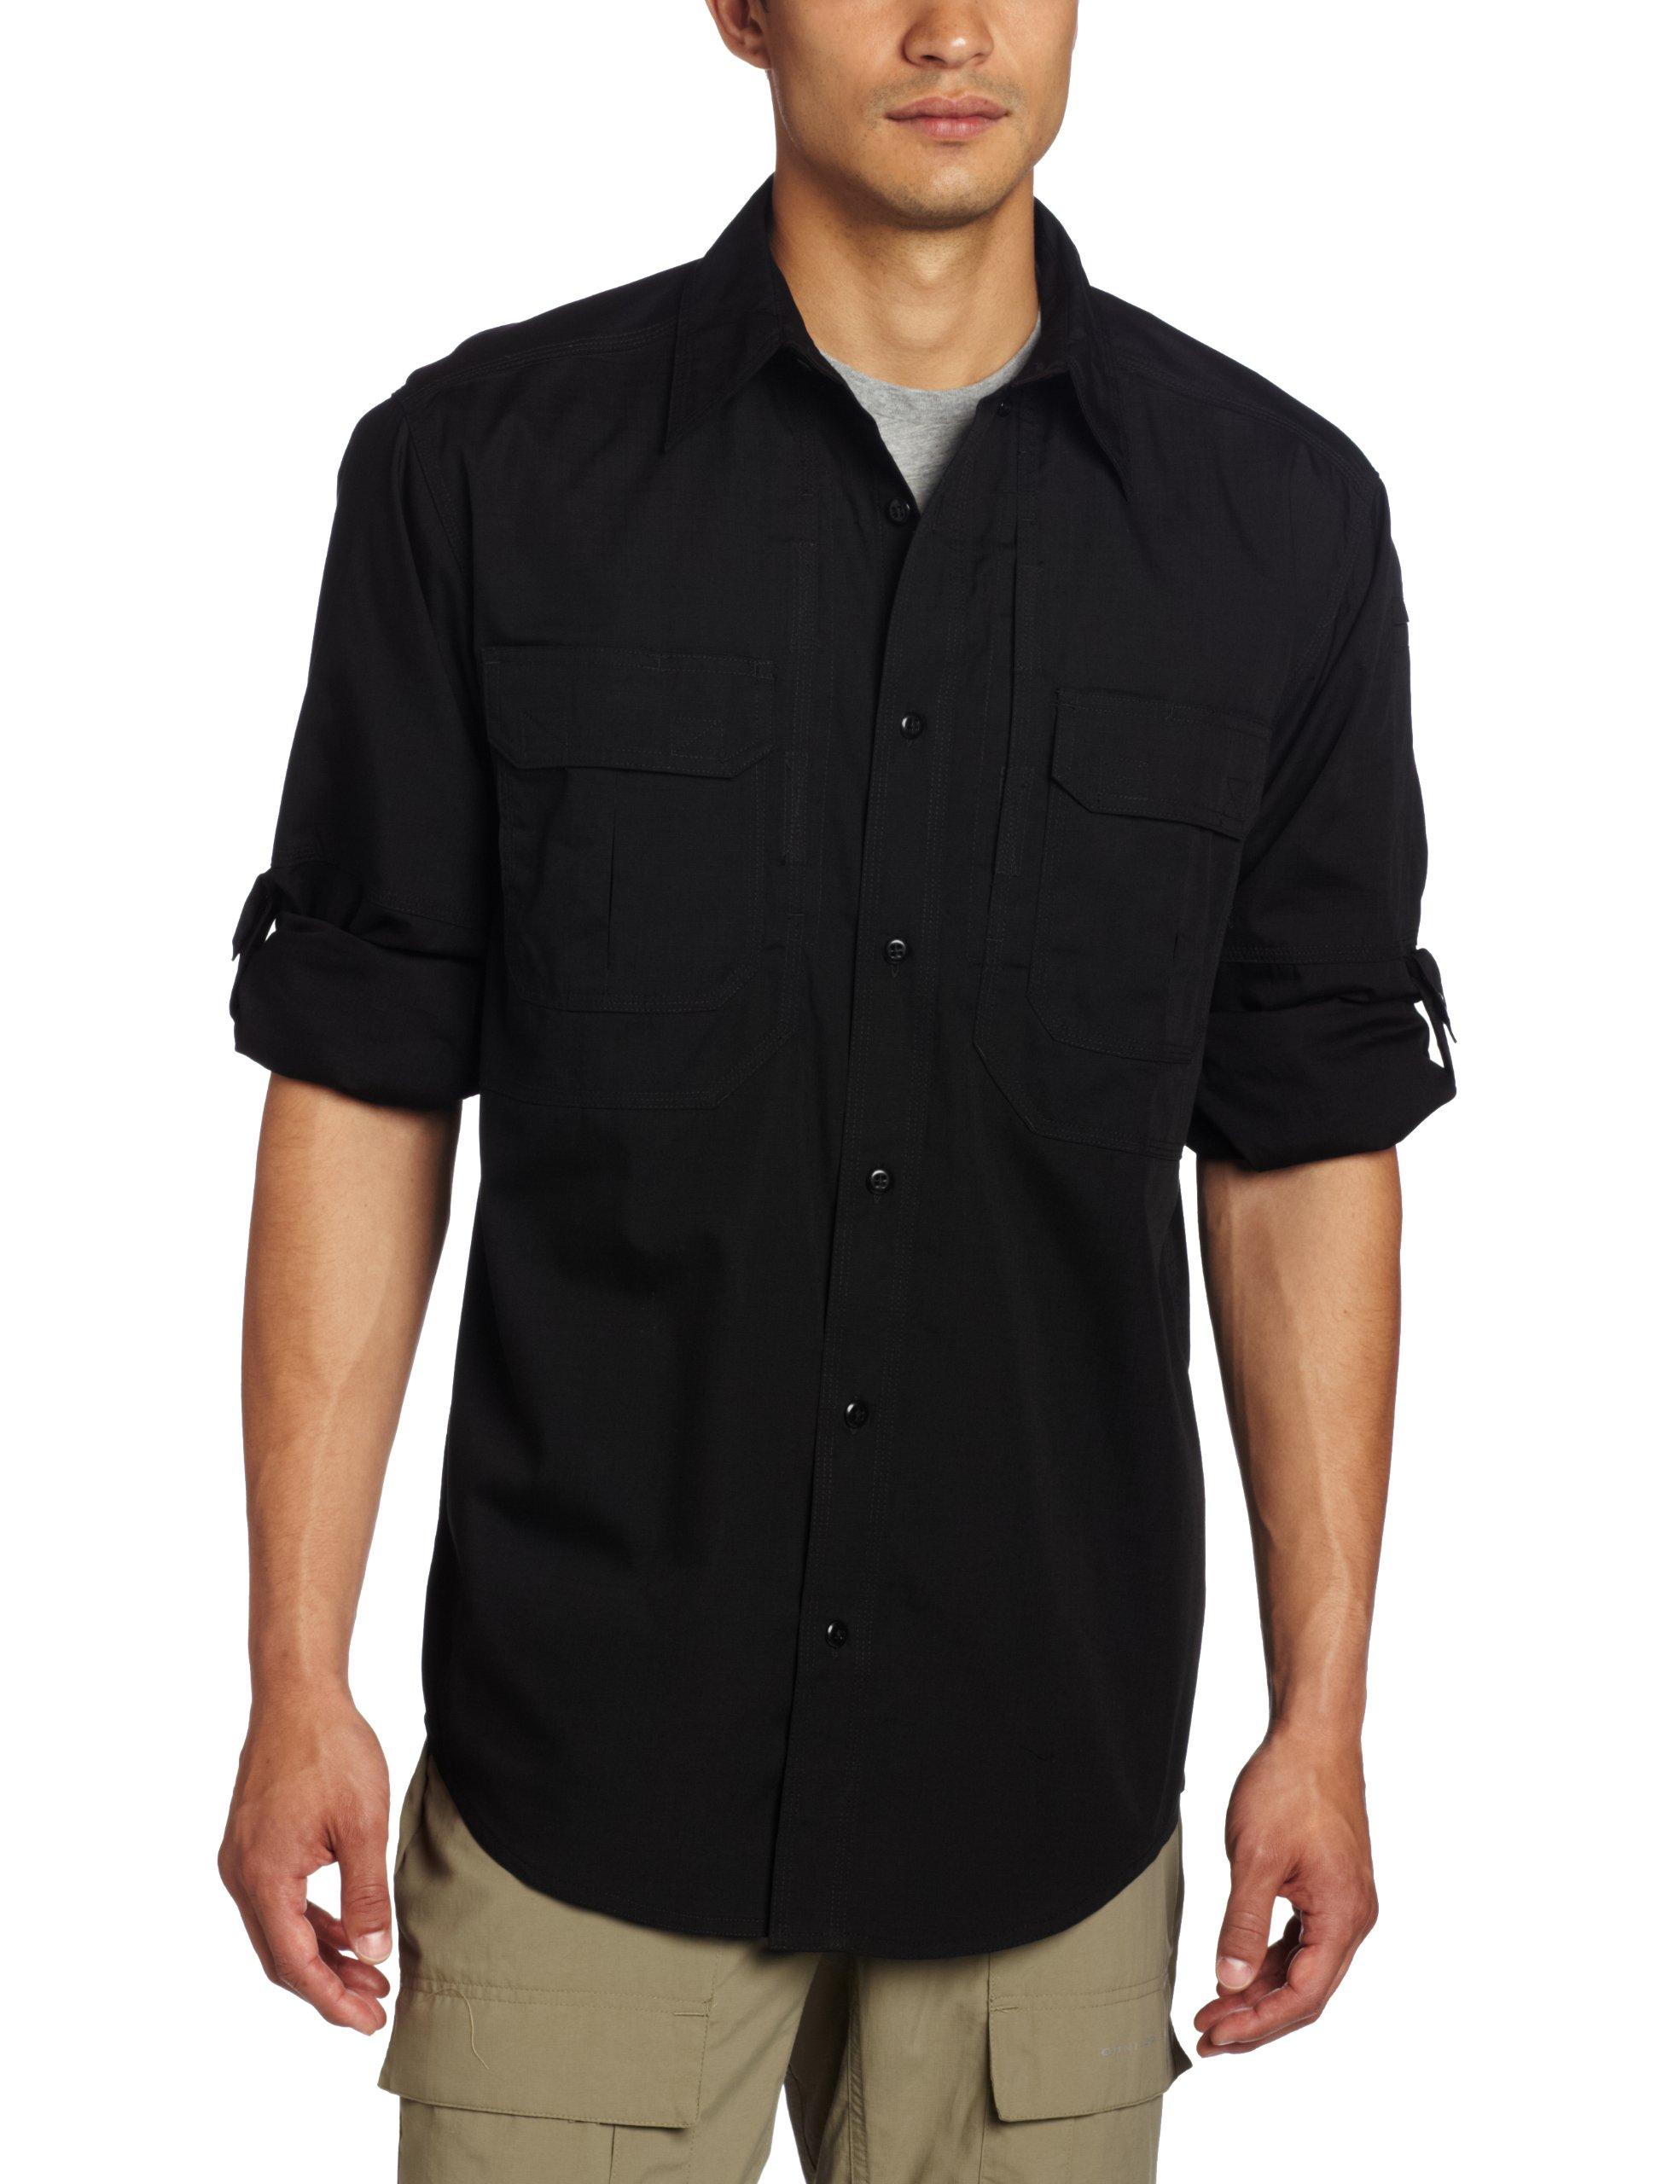 5.11 Tactical TacLite Professional Long Sleeve Shirt, Black, Medium